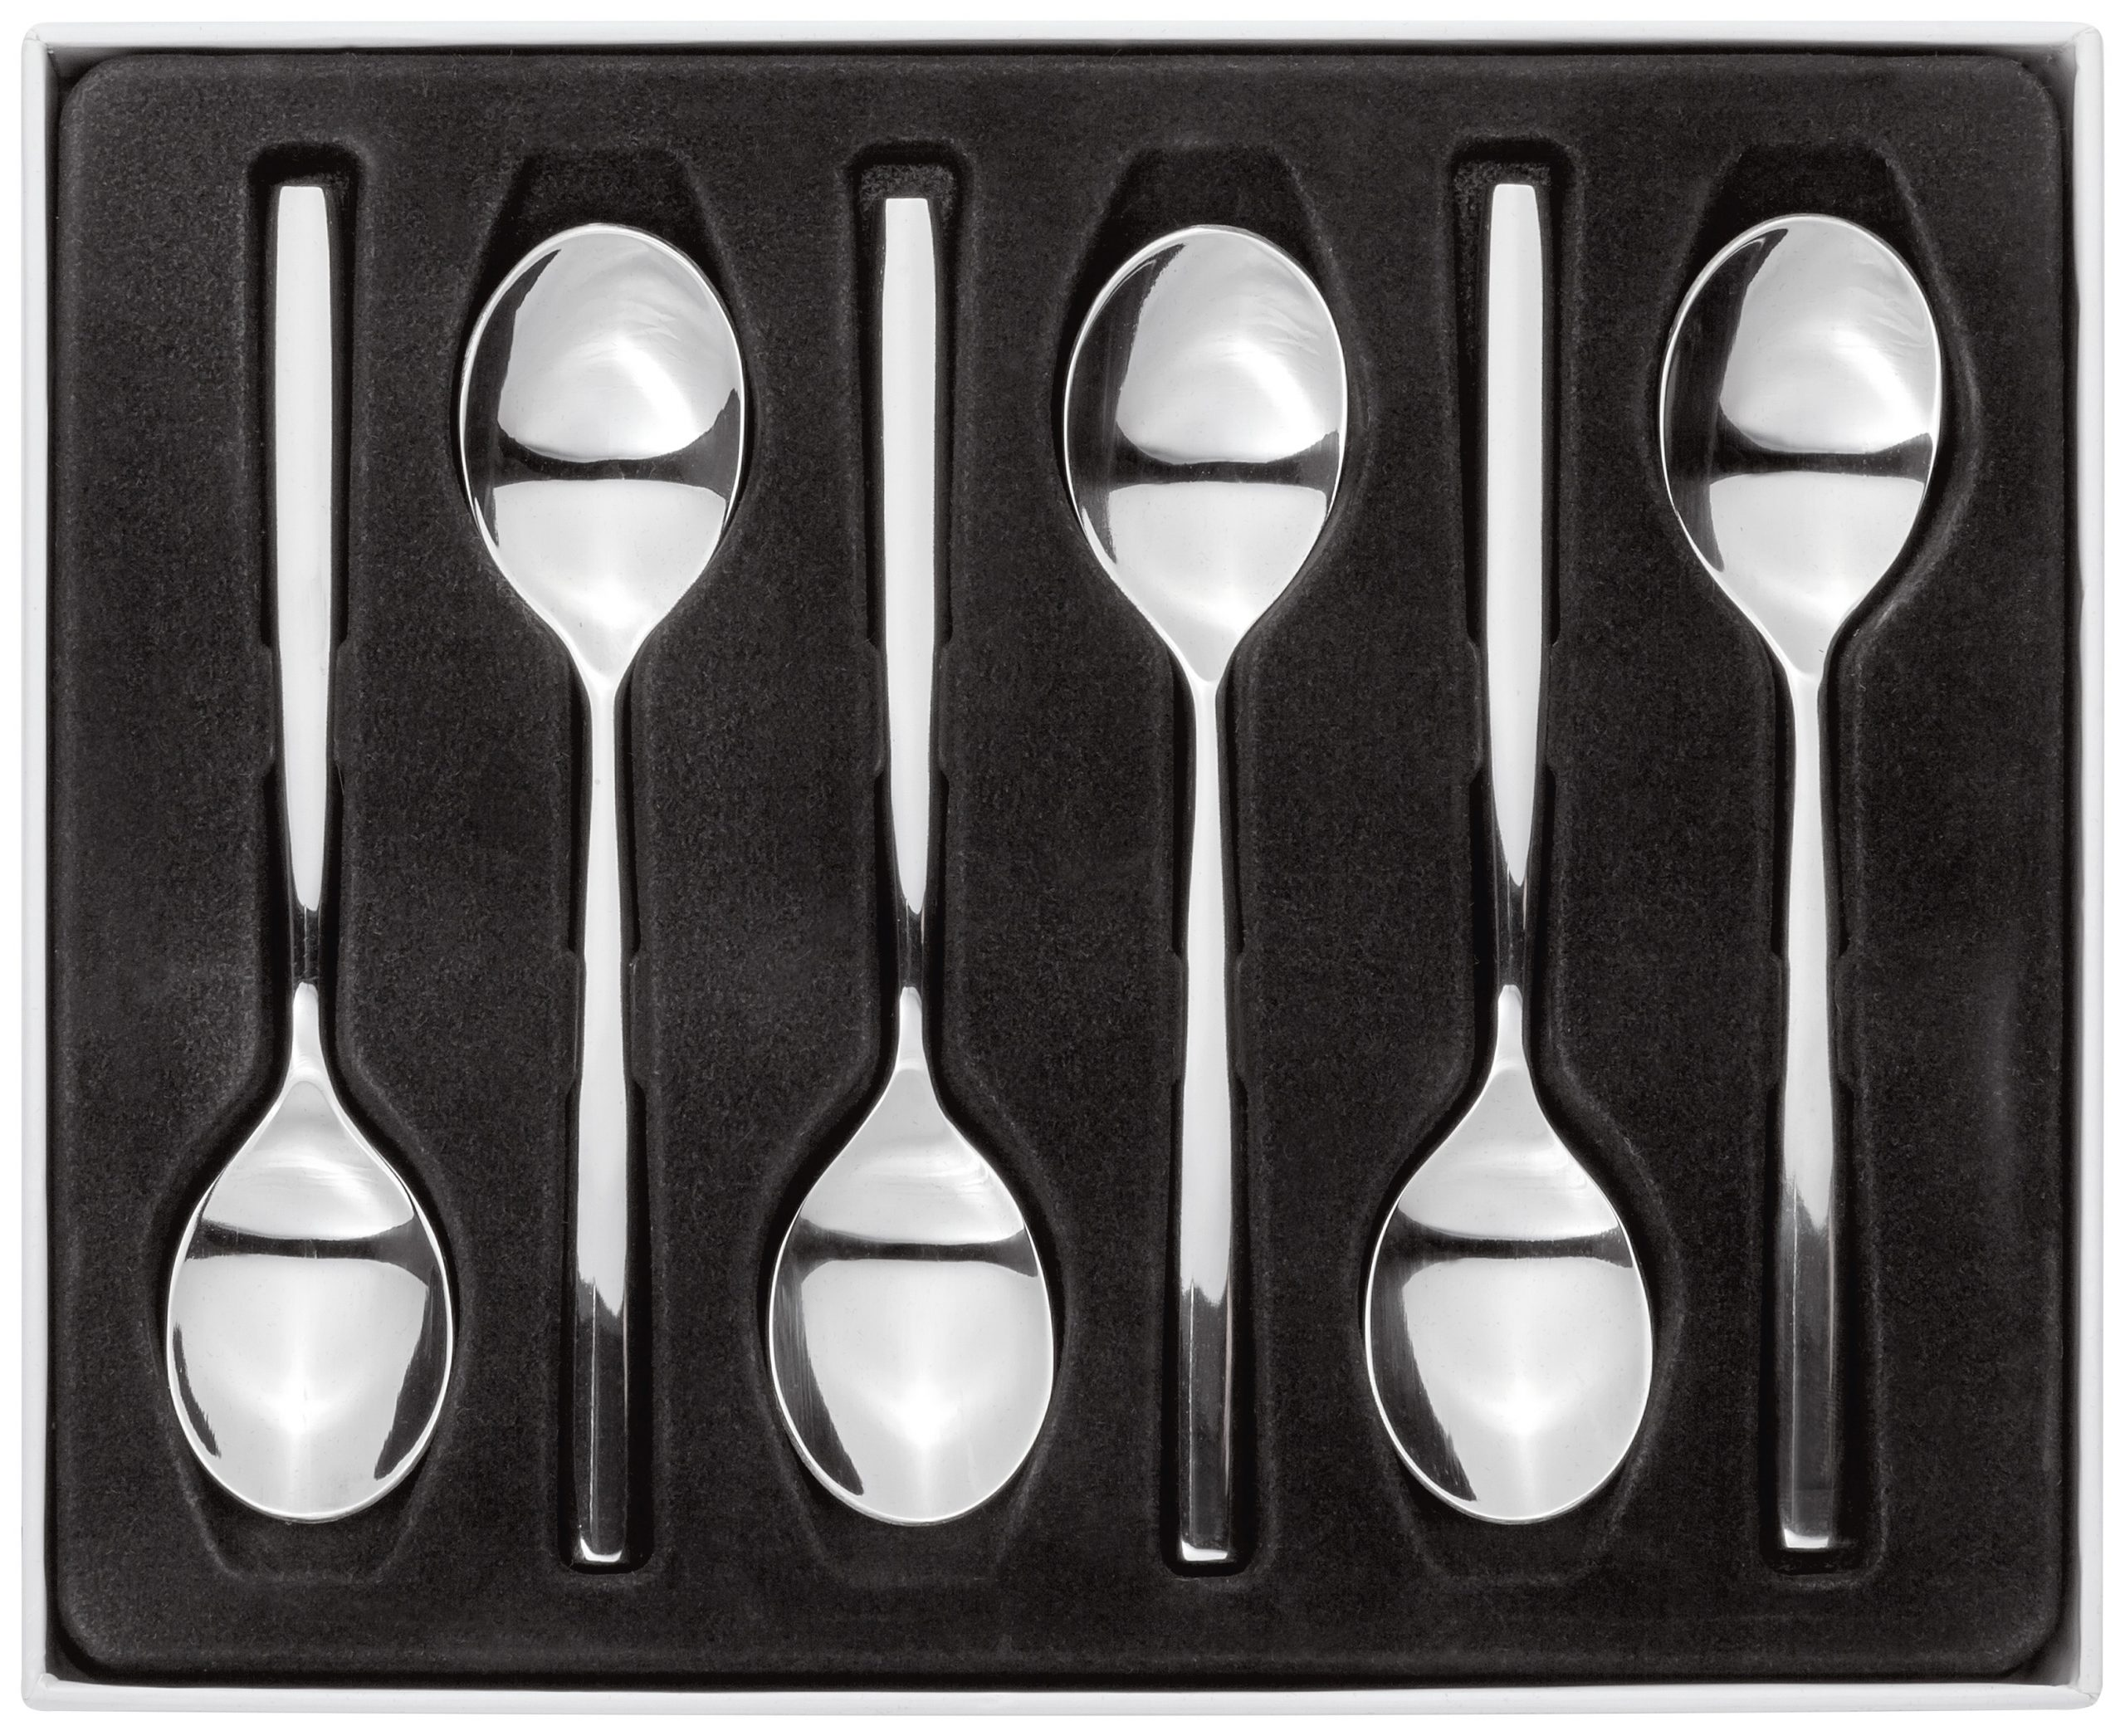 Cutlery Rochester set of 6 Teaspoons  SET OF 6 TEASPOONS